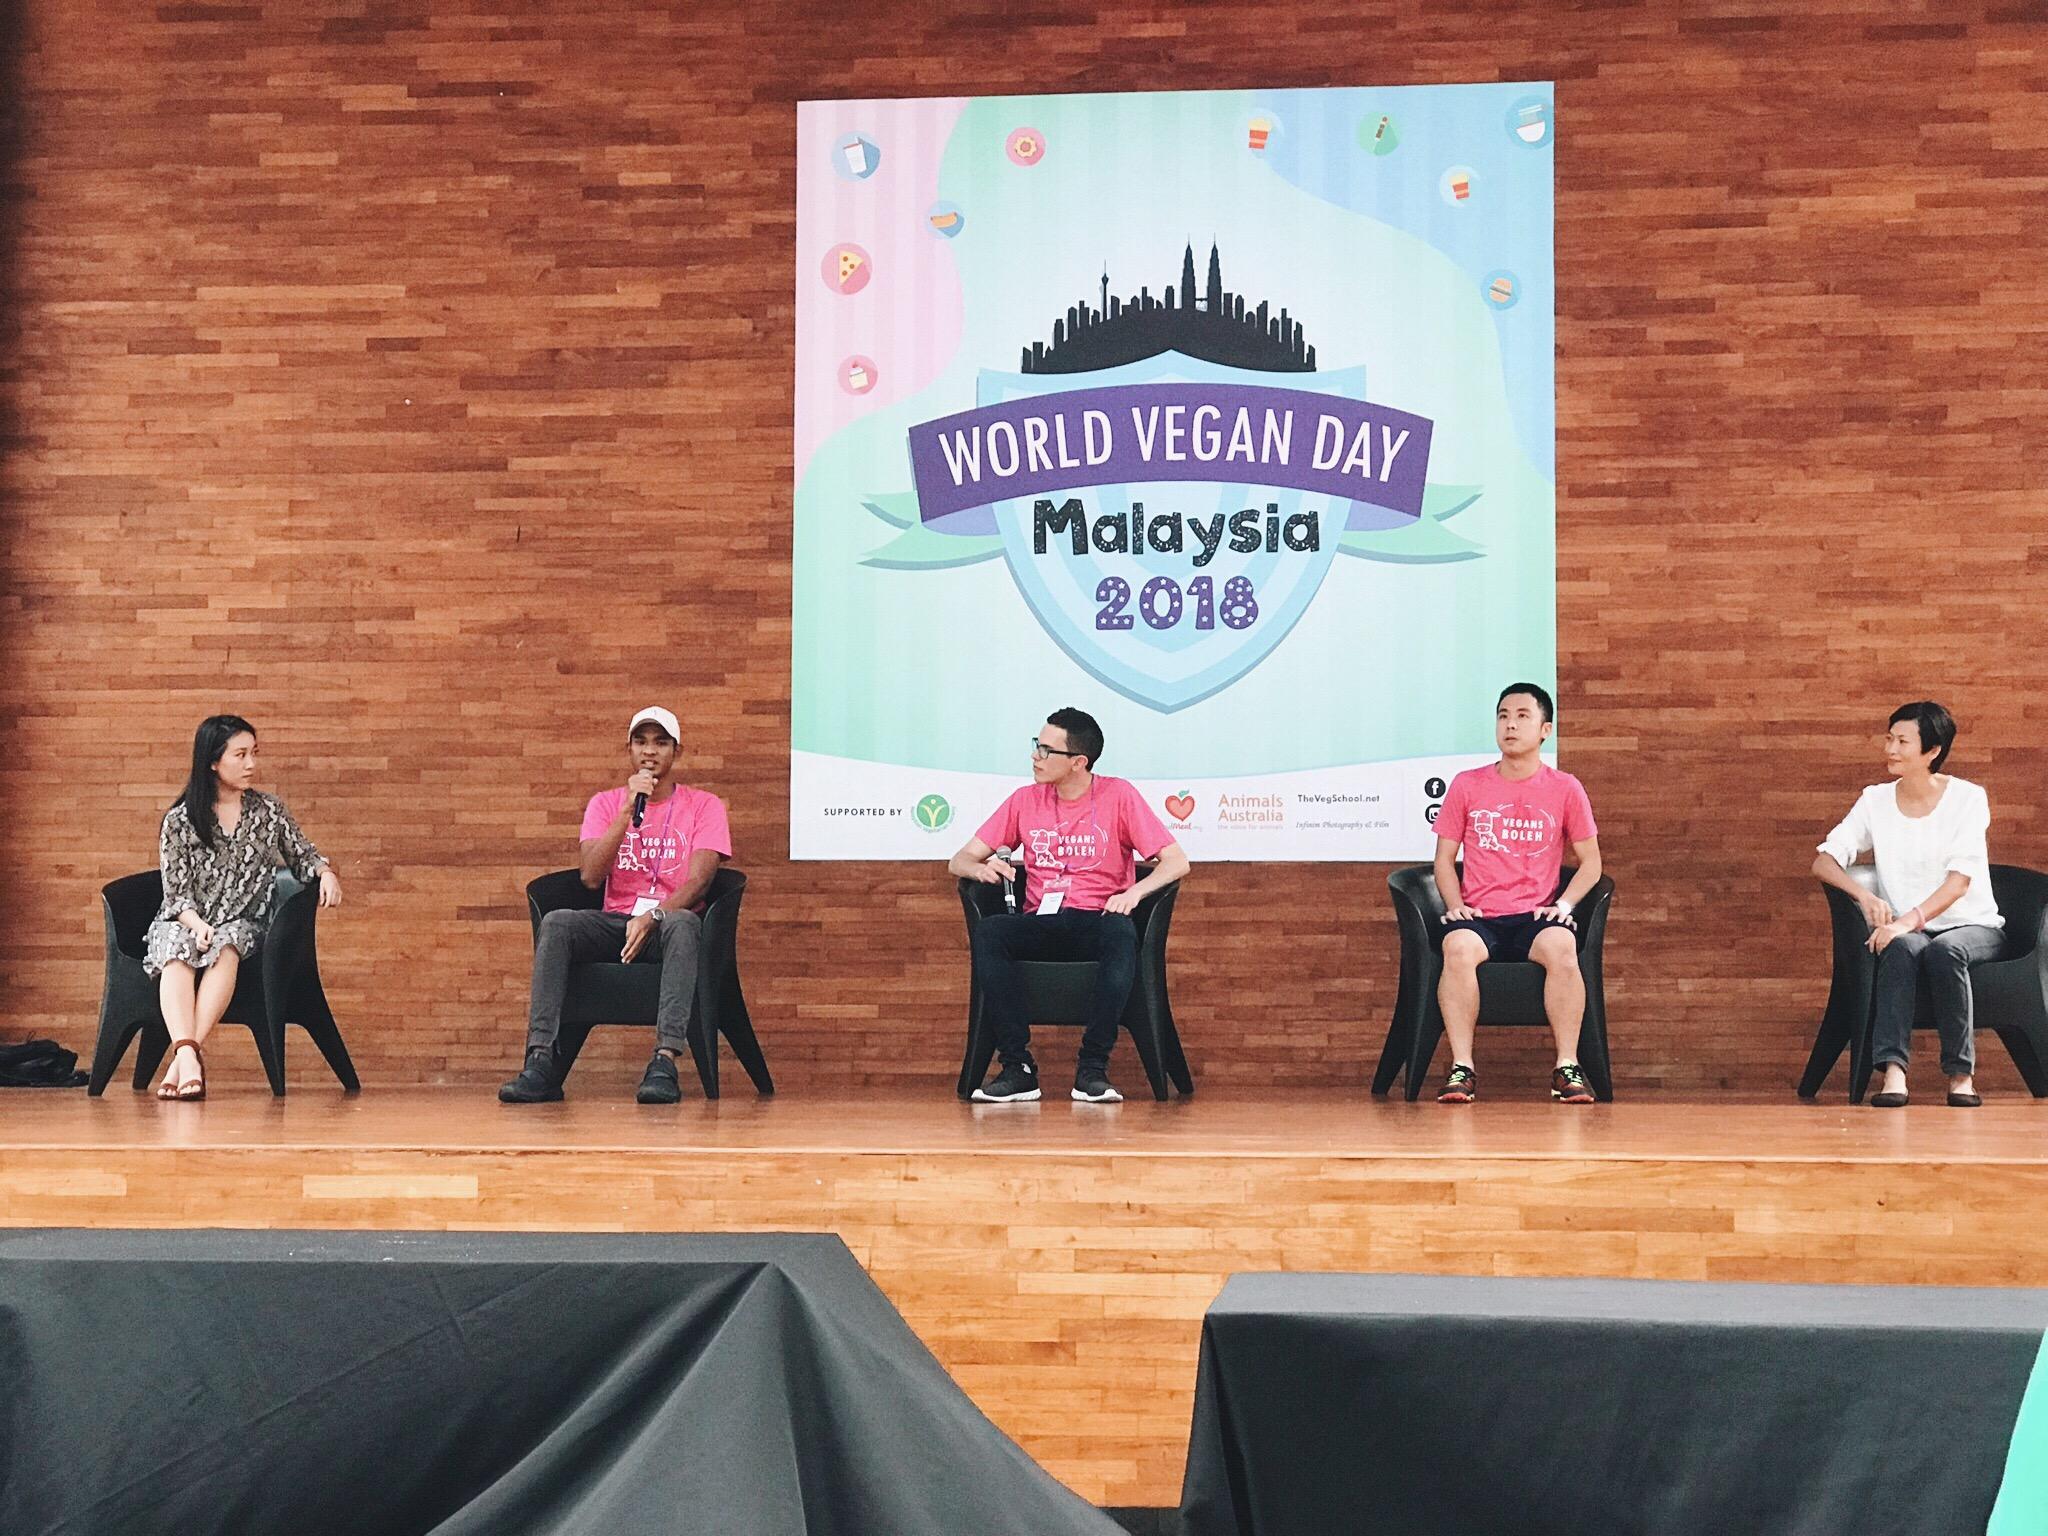 world vegan day malaysia